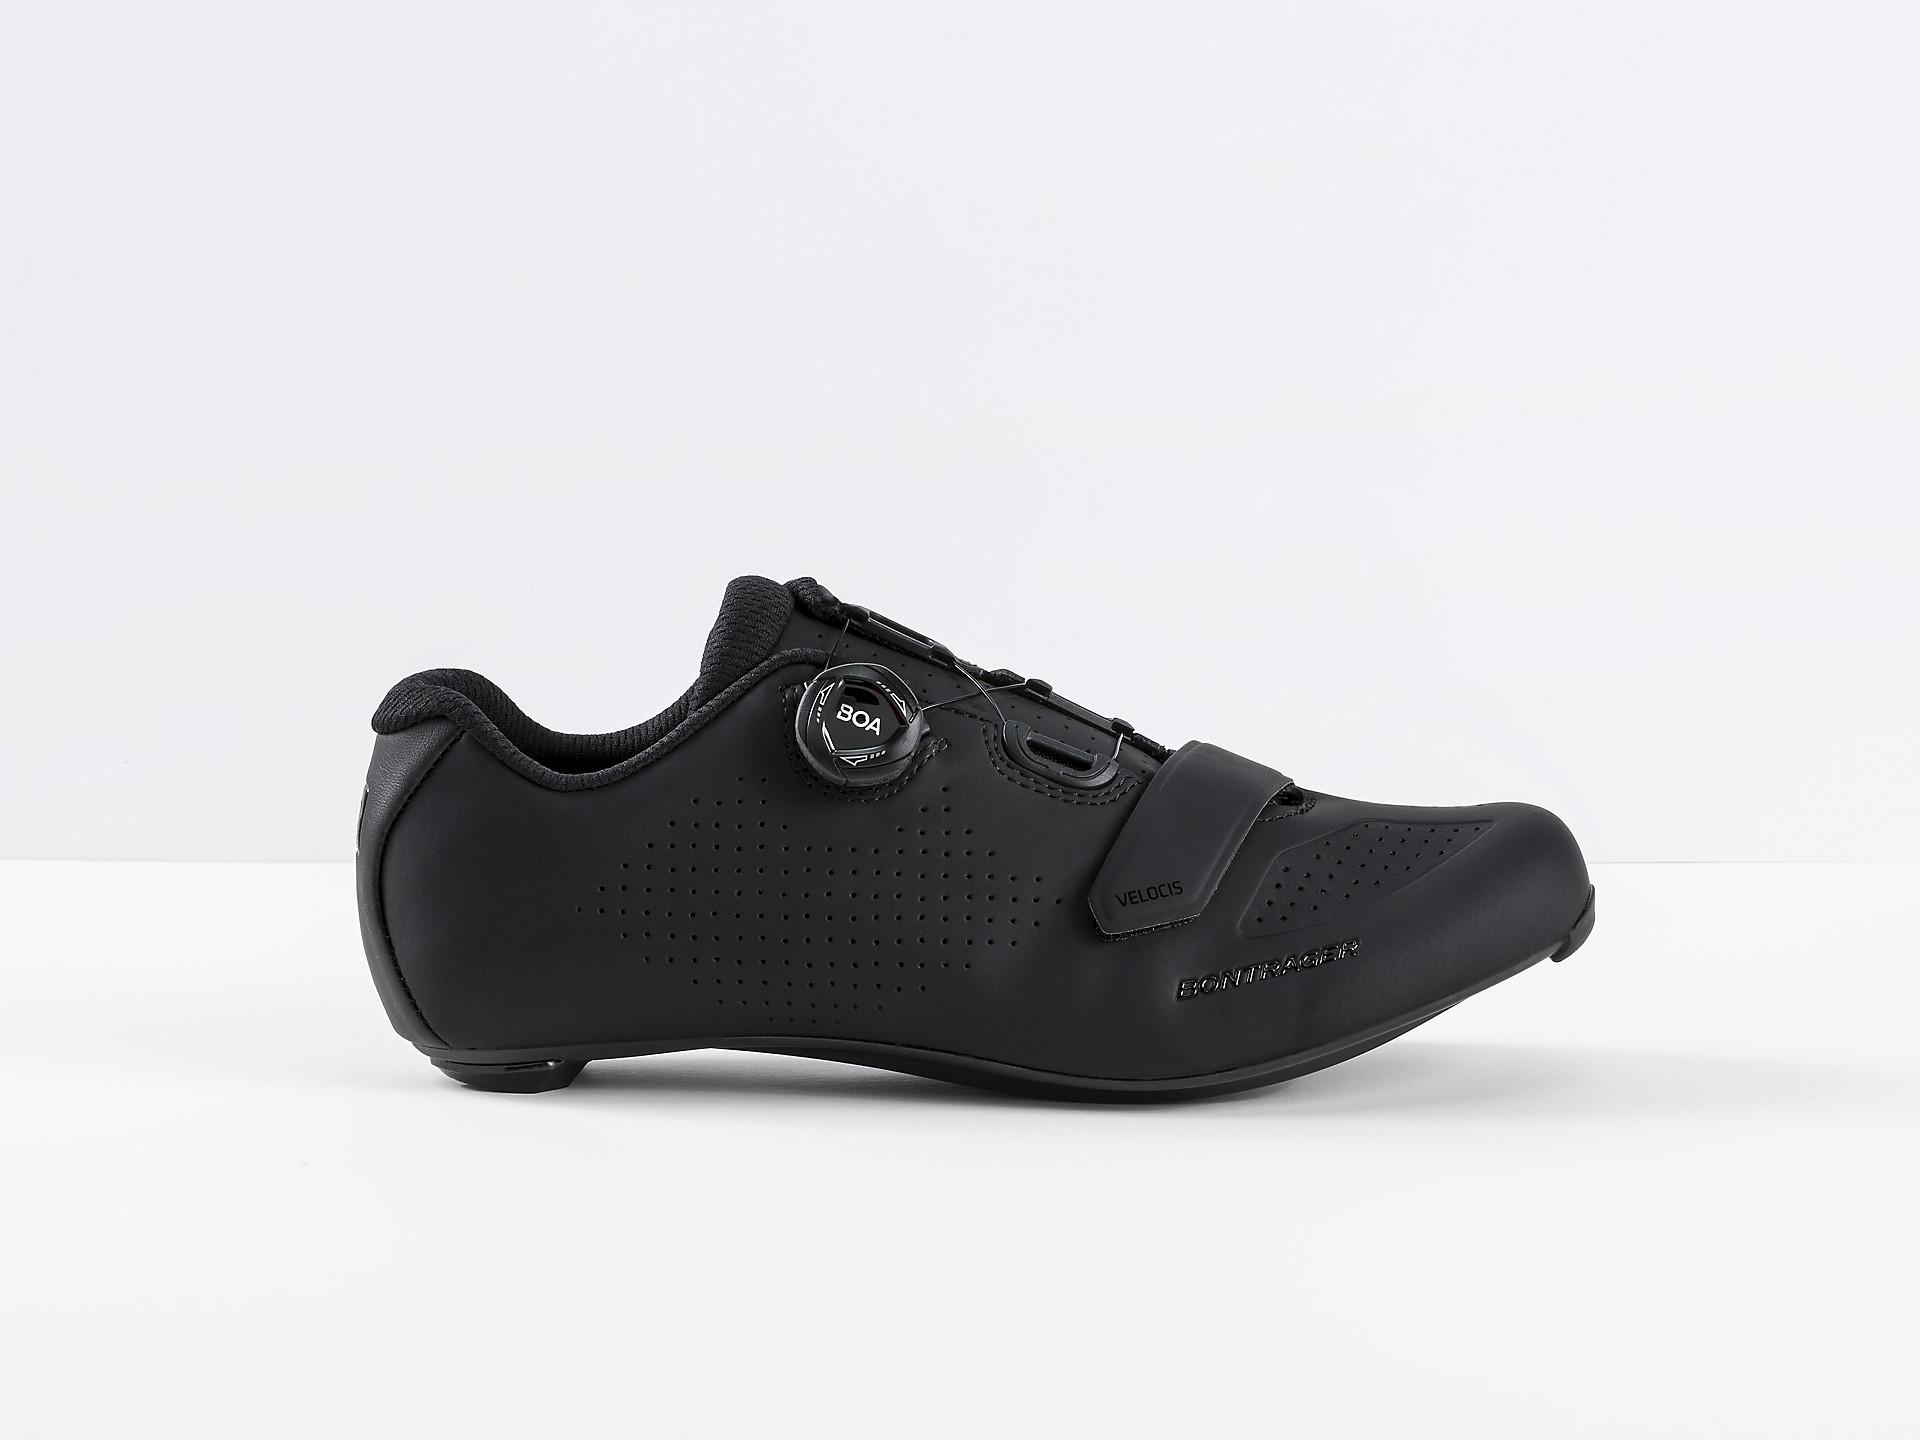 VelocisTrek Route Bikesch Bontrager Chaussures Aj4LR5